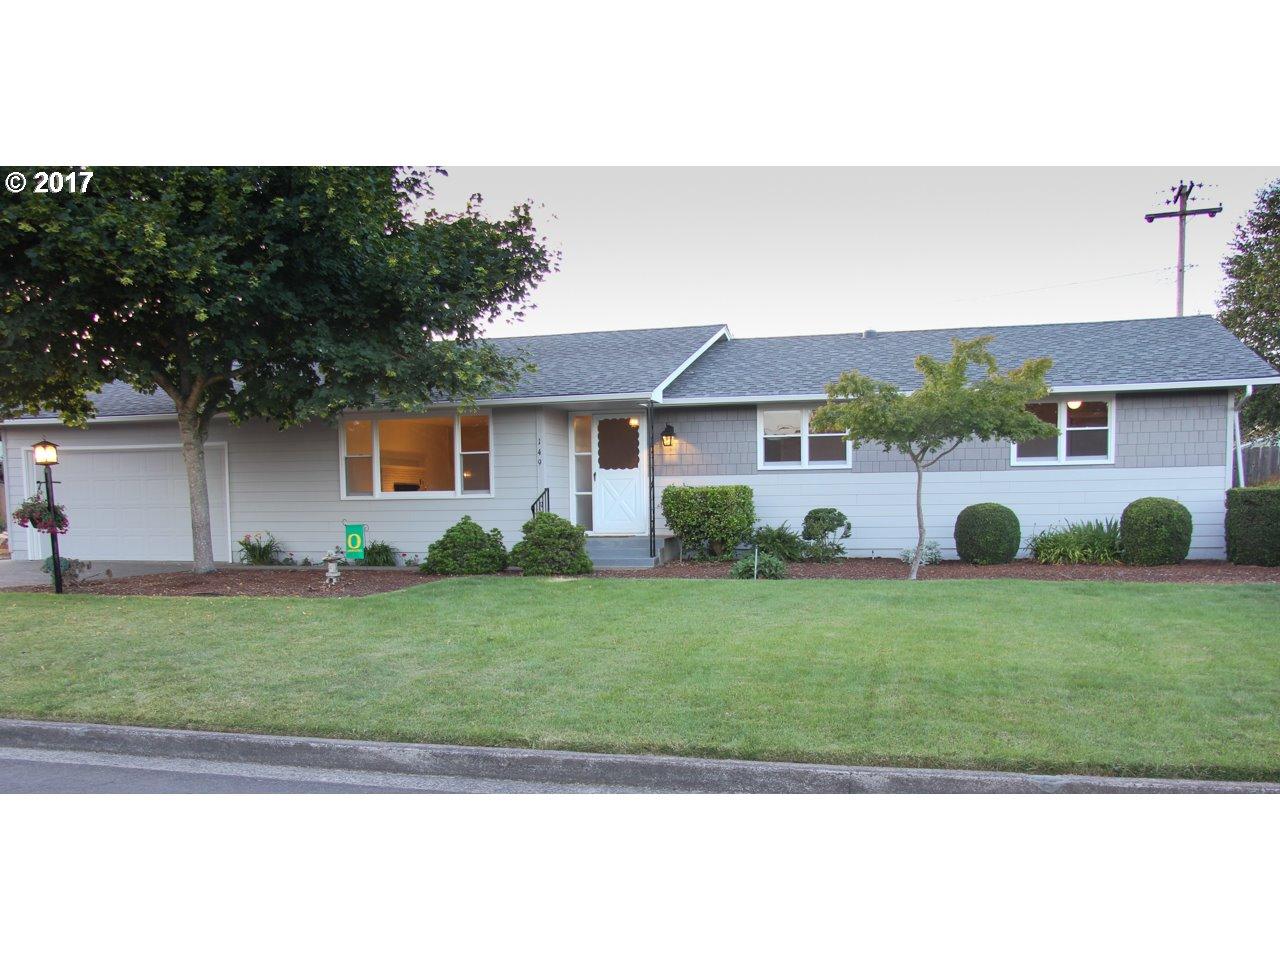 149 E ANCHOR AVE, Eugene, OR 97404